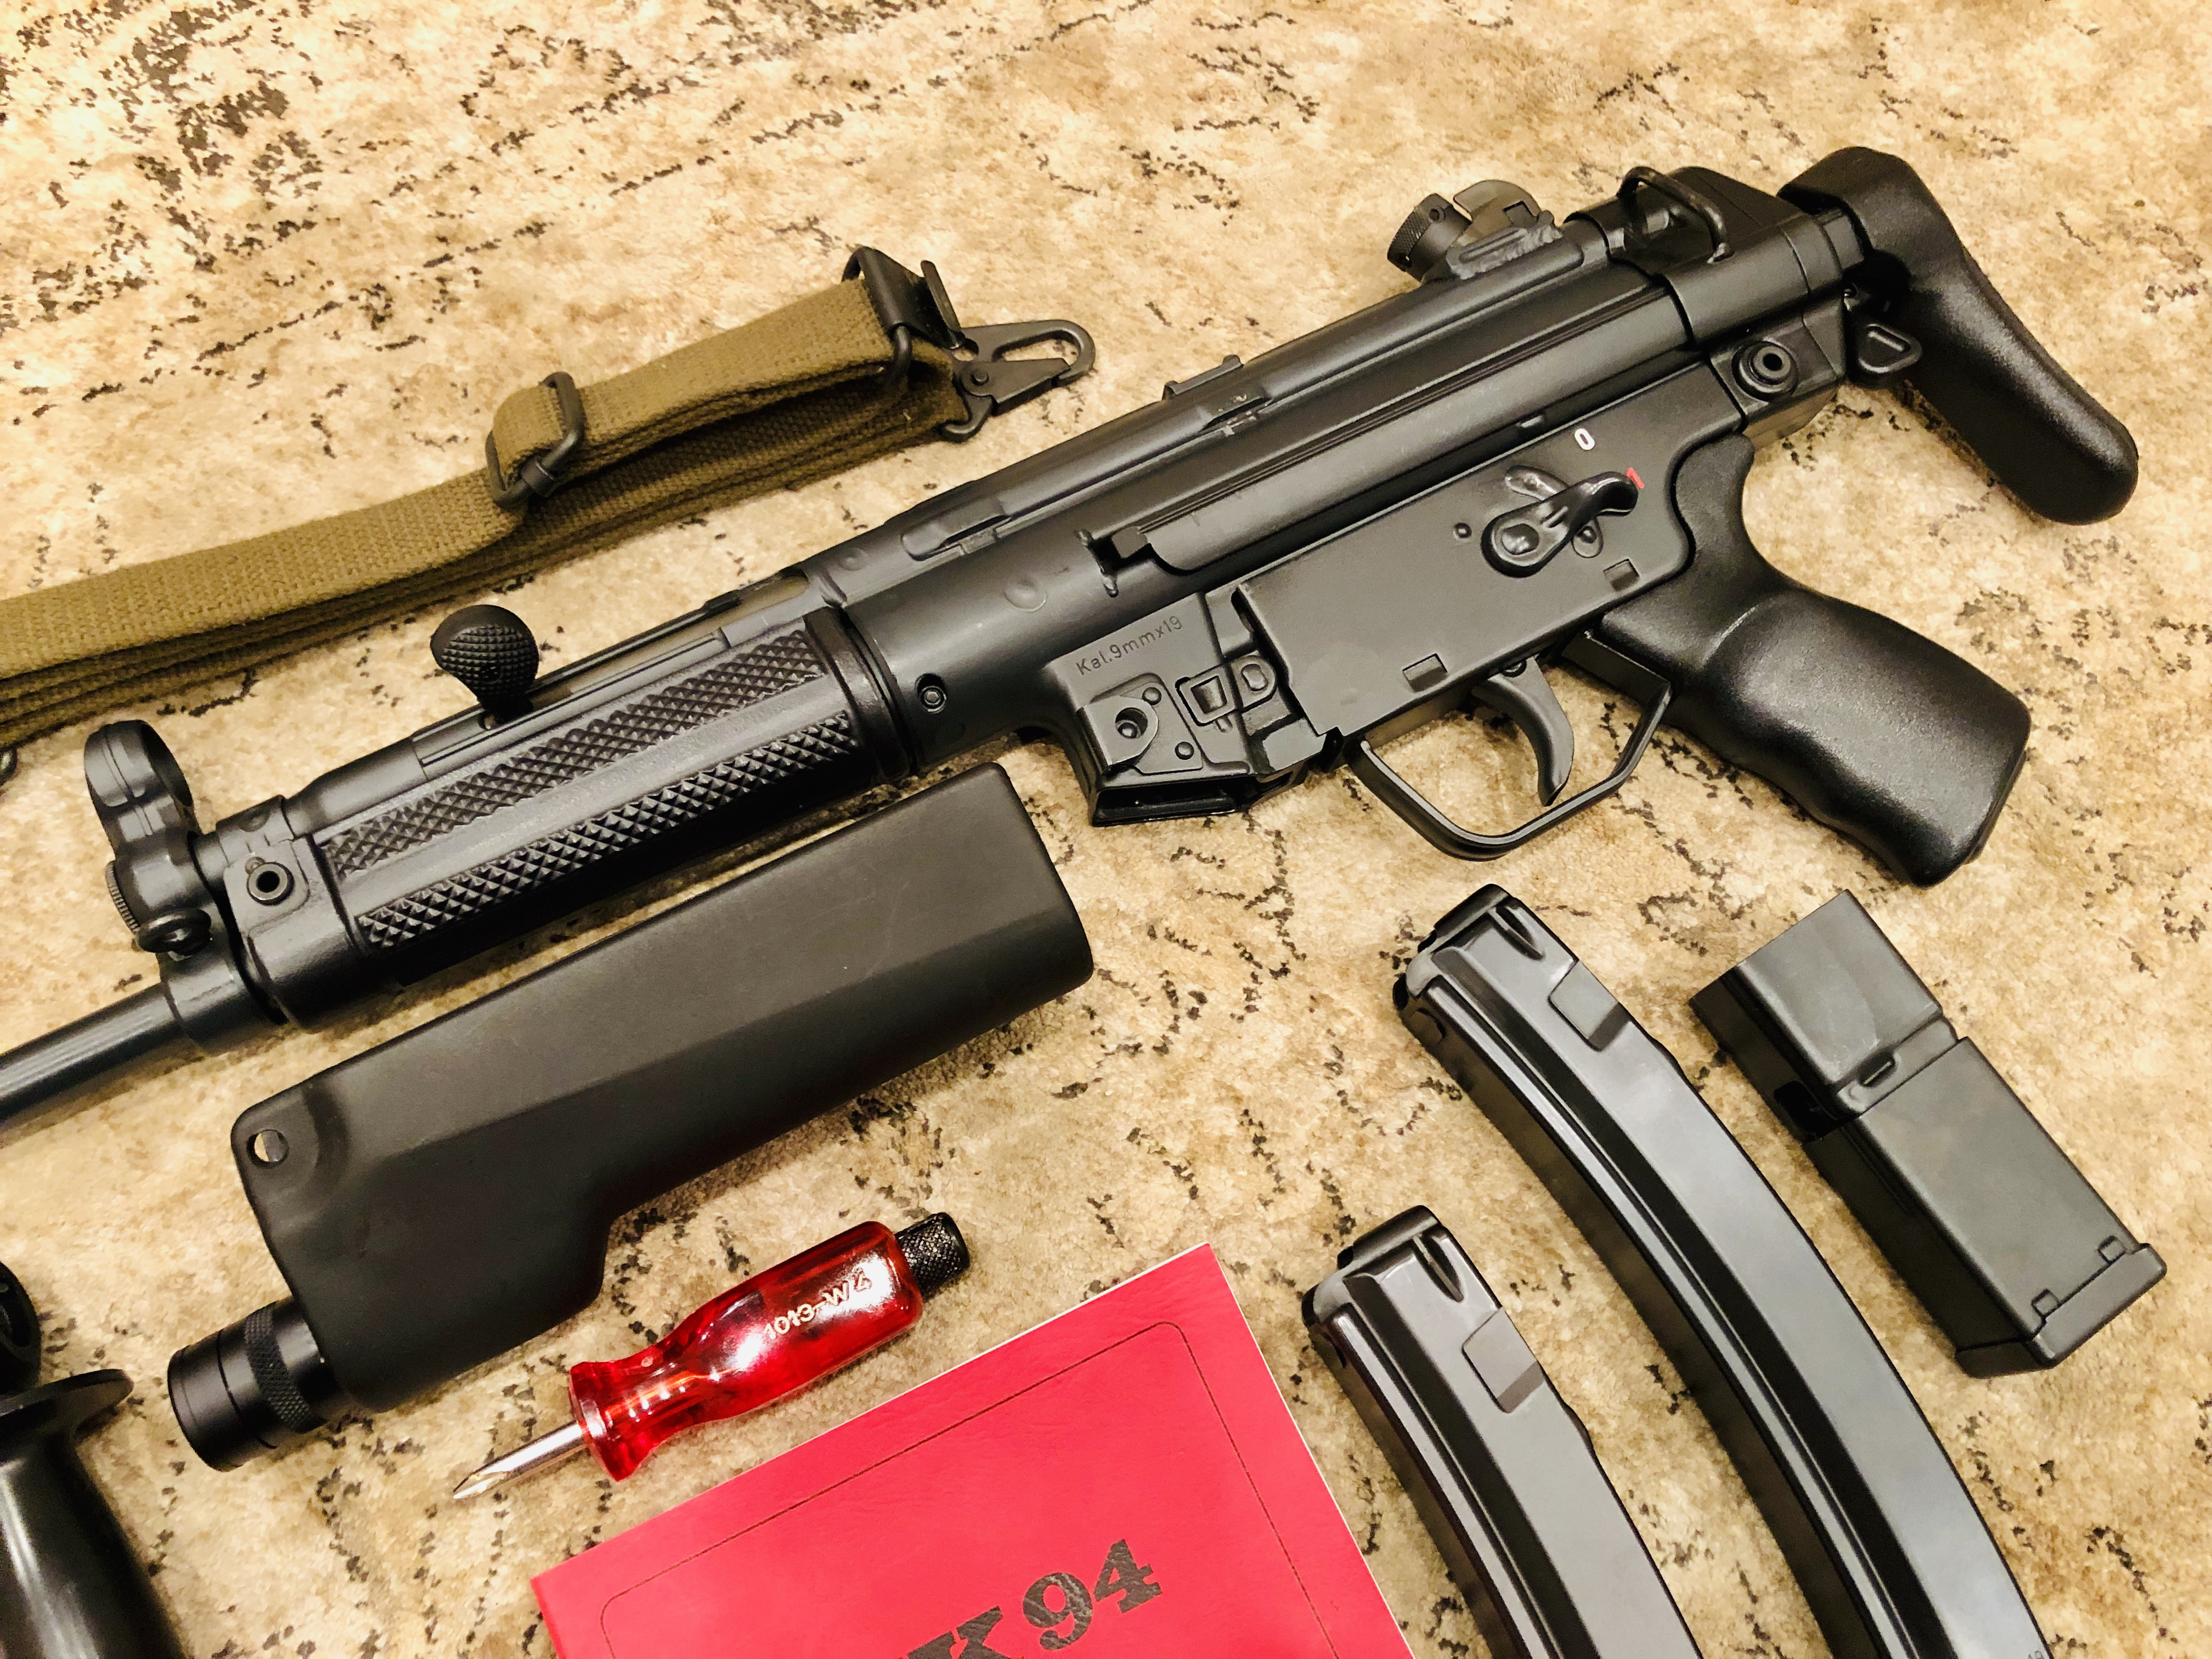 HK94 ID Code-bc92b60c-a8d0-40fc-87a0-3d81407a945f.jpeg